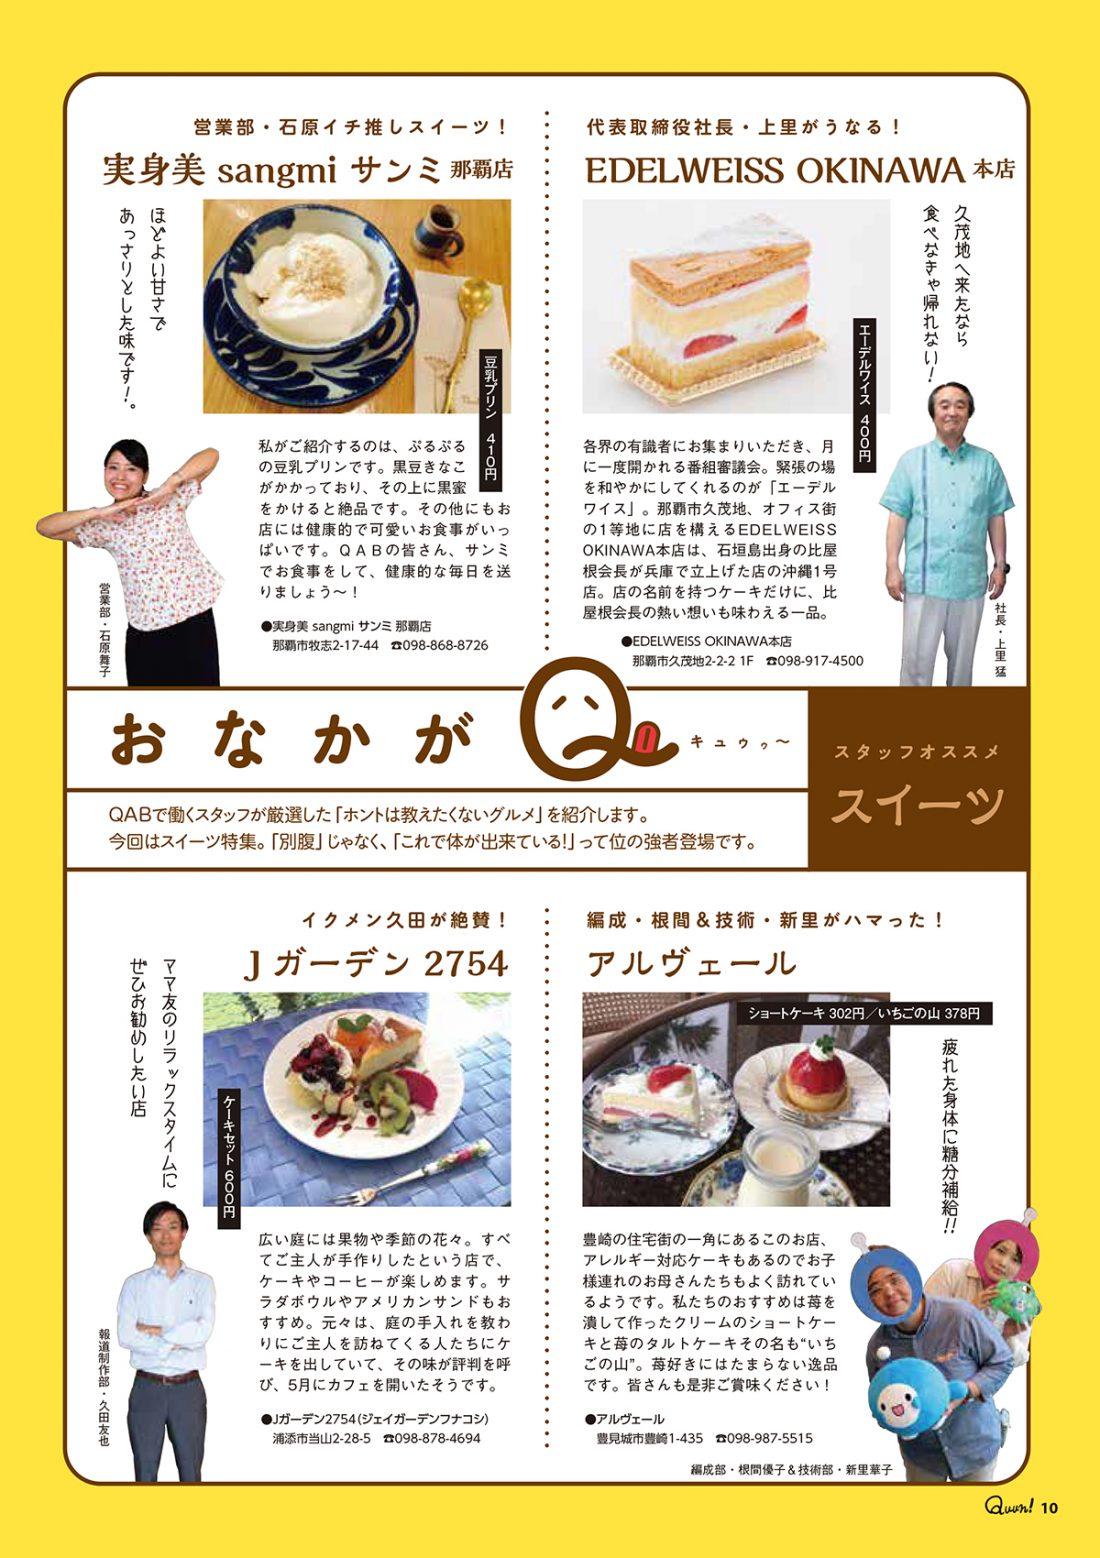 http://www.qab.co.jp/qgoro/wp-content/uploads/quun_0412-1100x1558.jpg